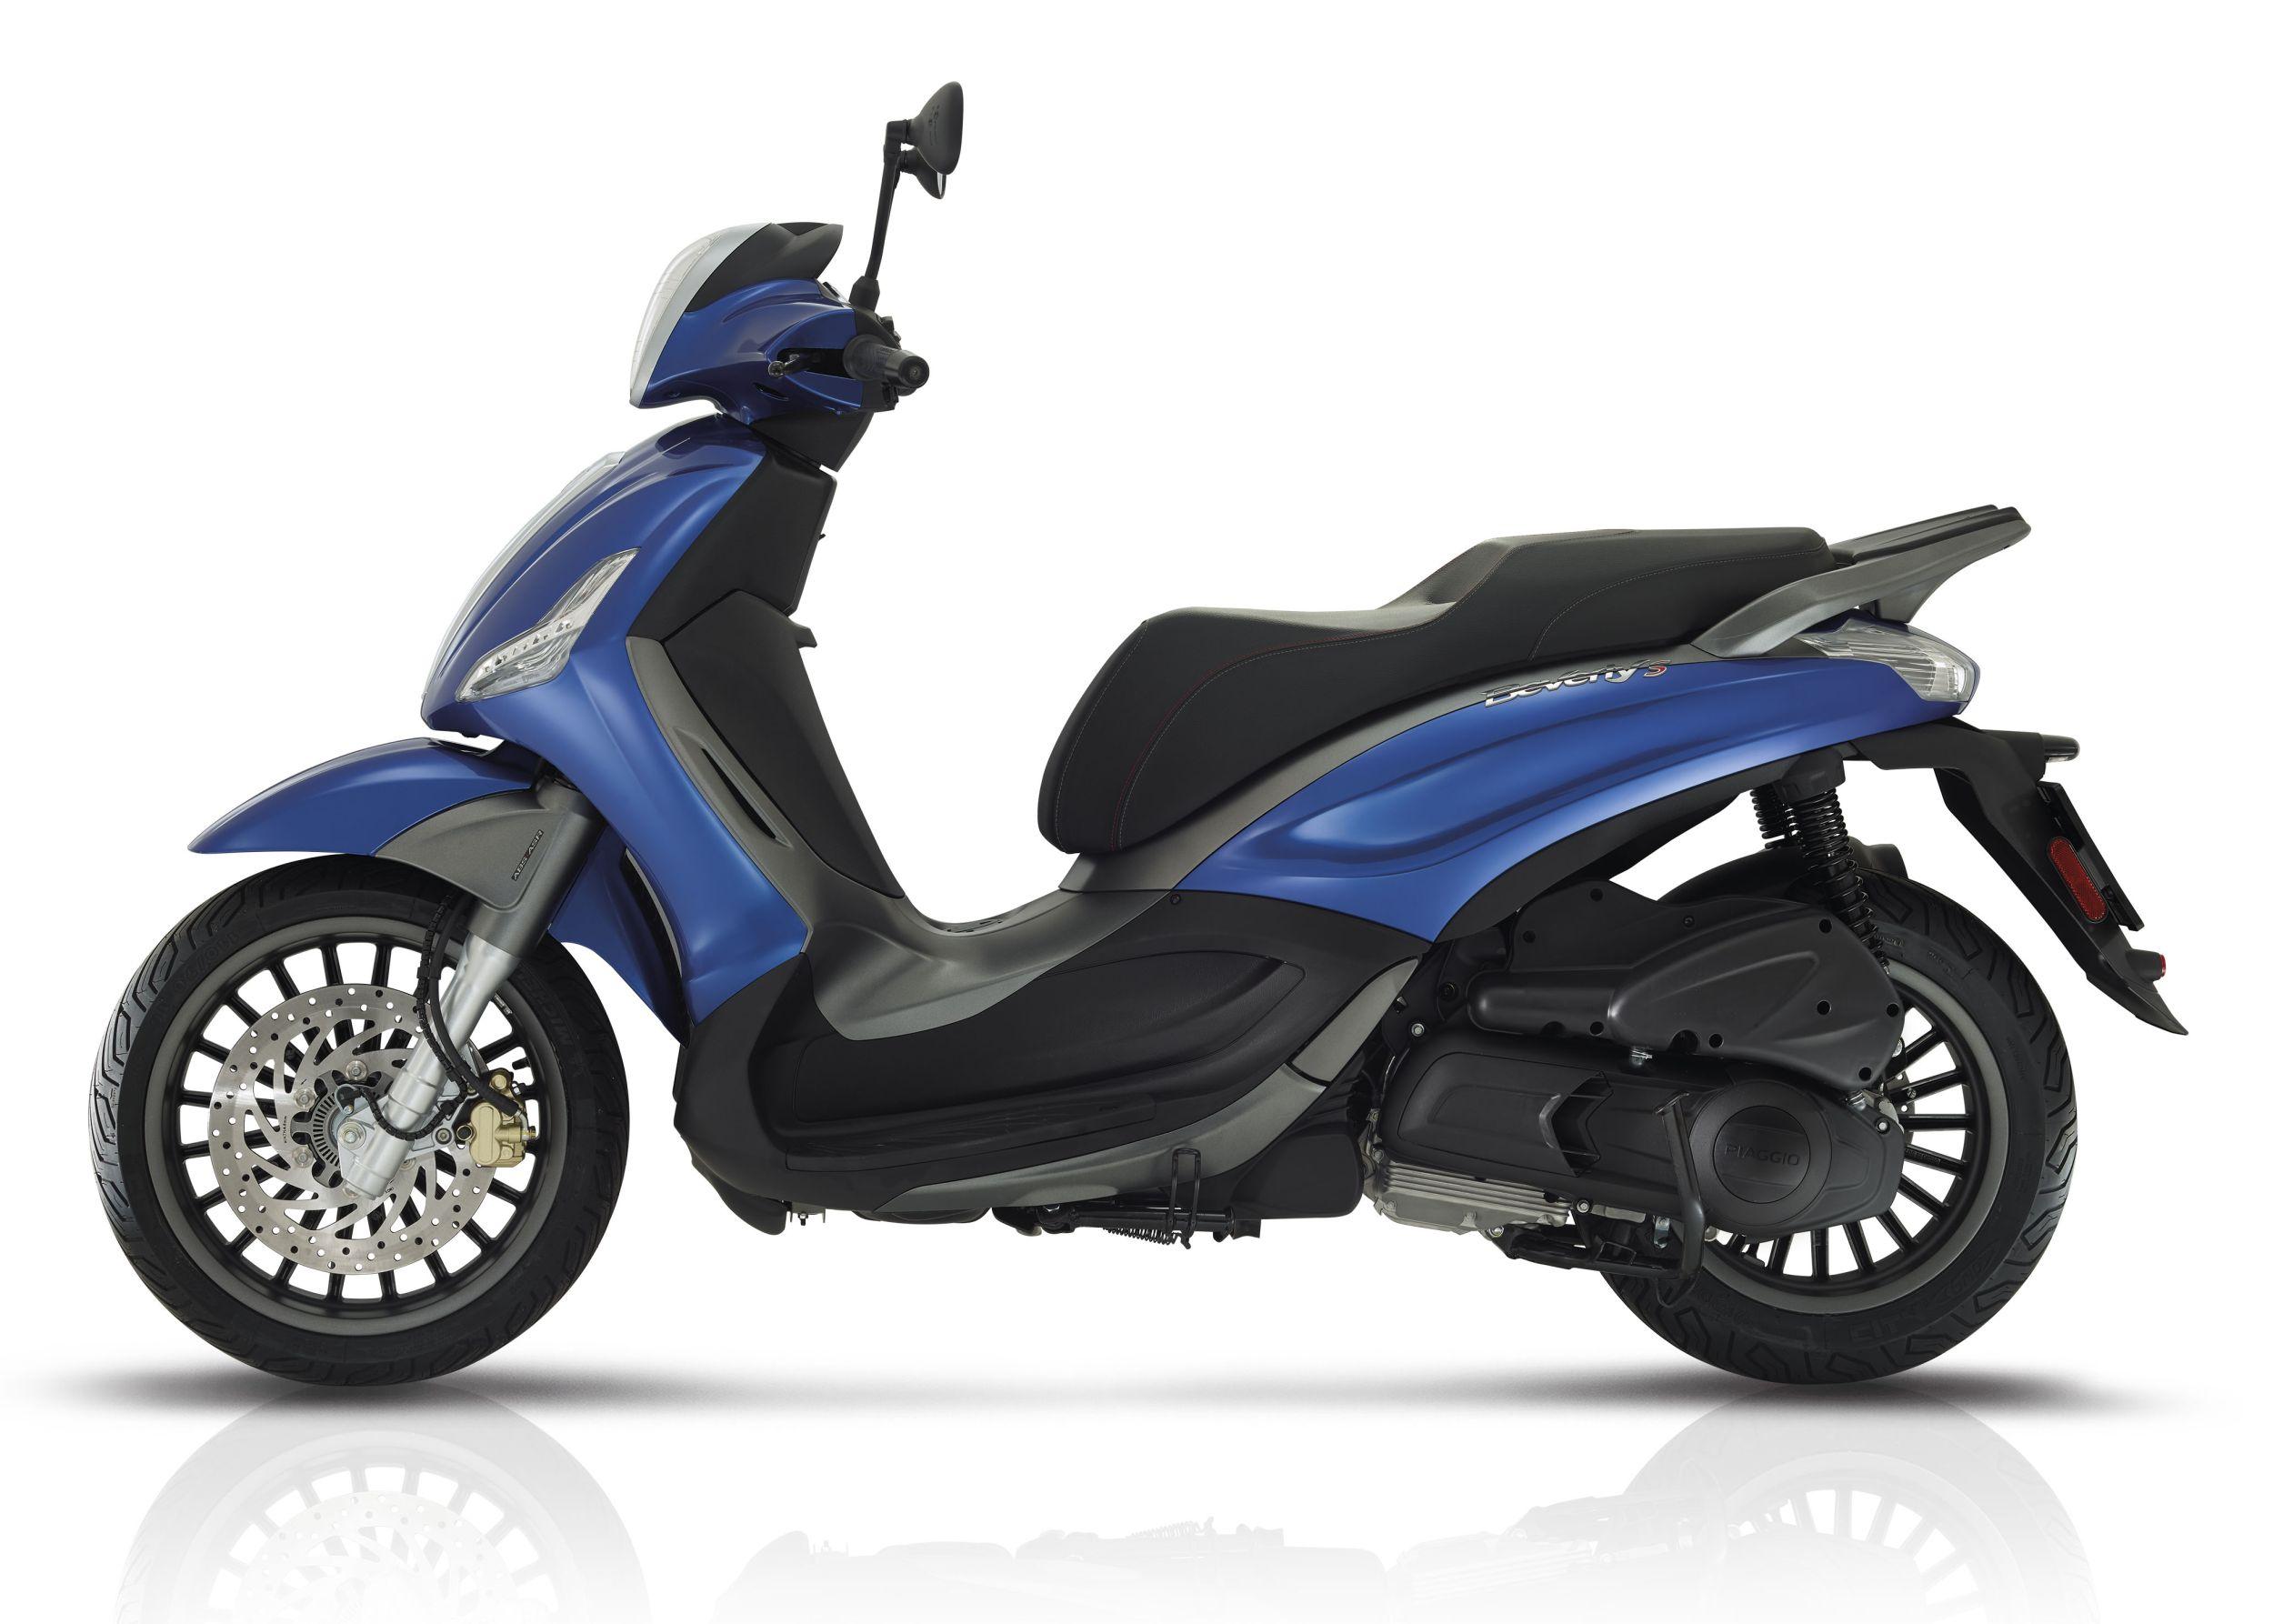 piaggio roller motorrad moto italia gebr dingeldey. Black Bedroom Furniture Sets. Home Design Ideas